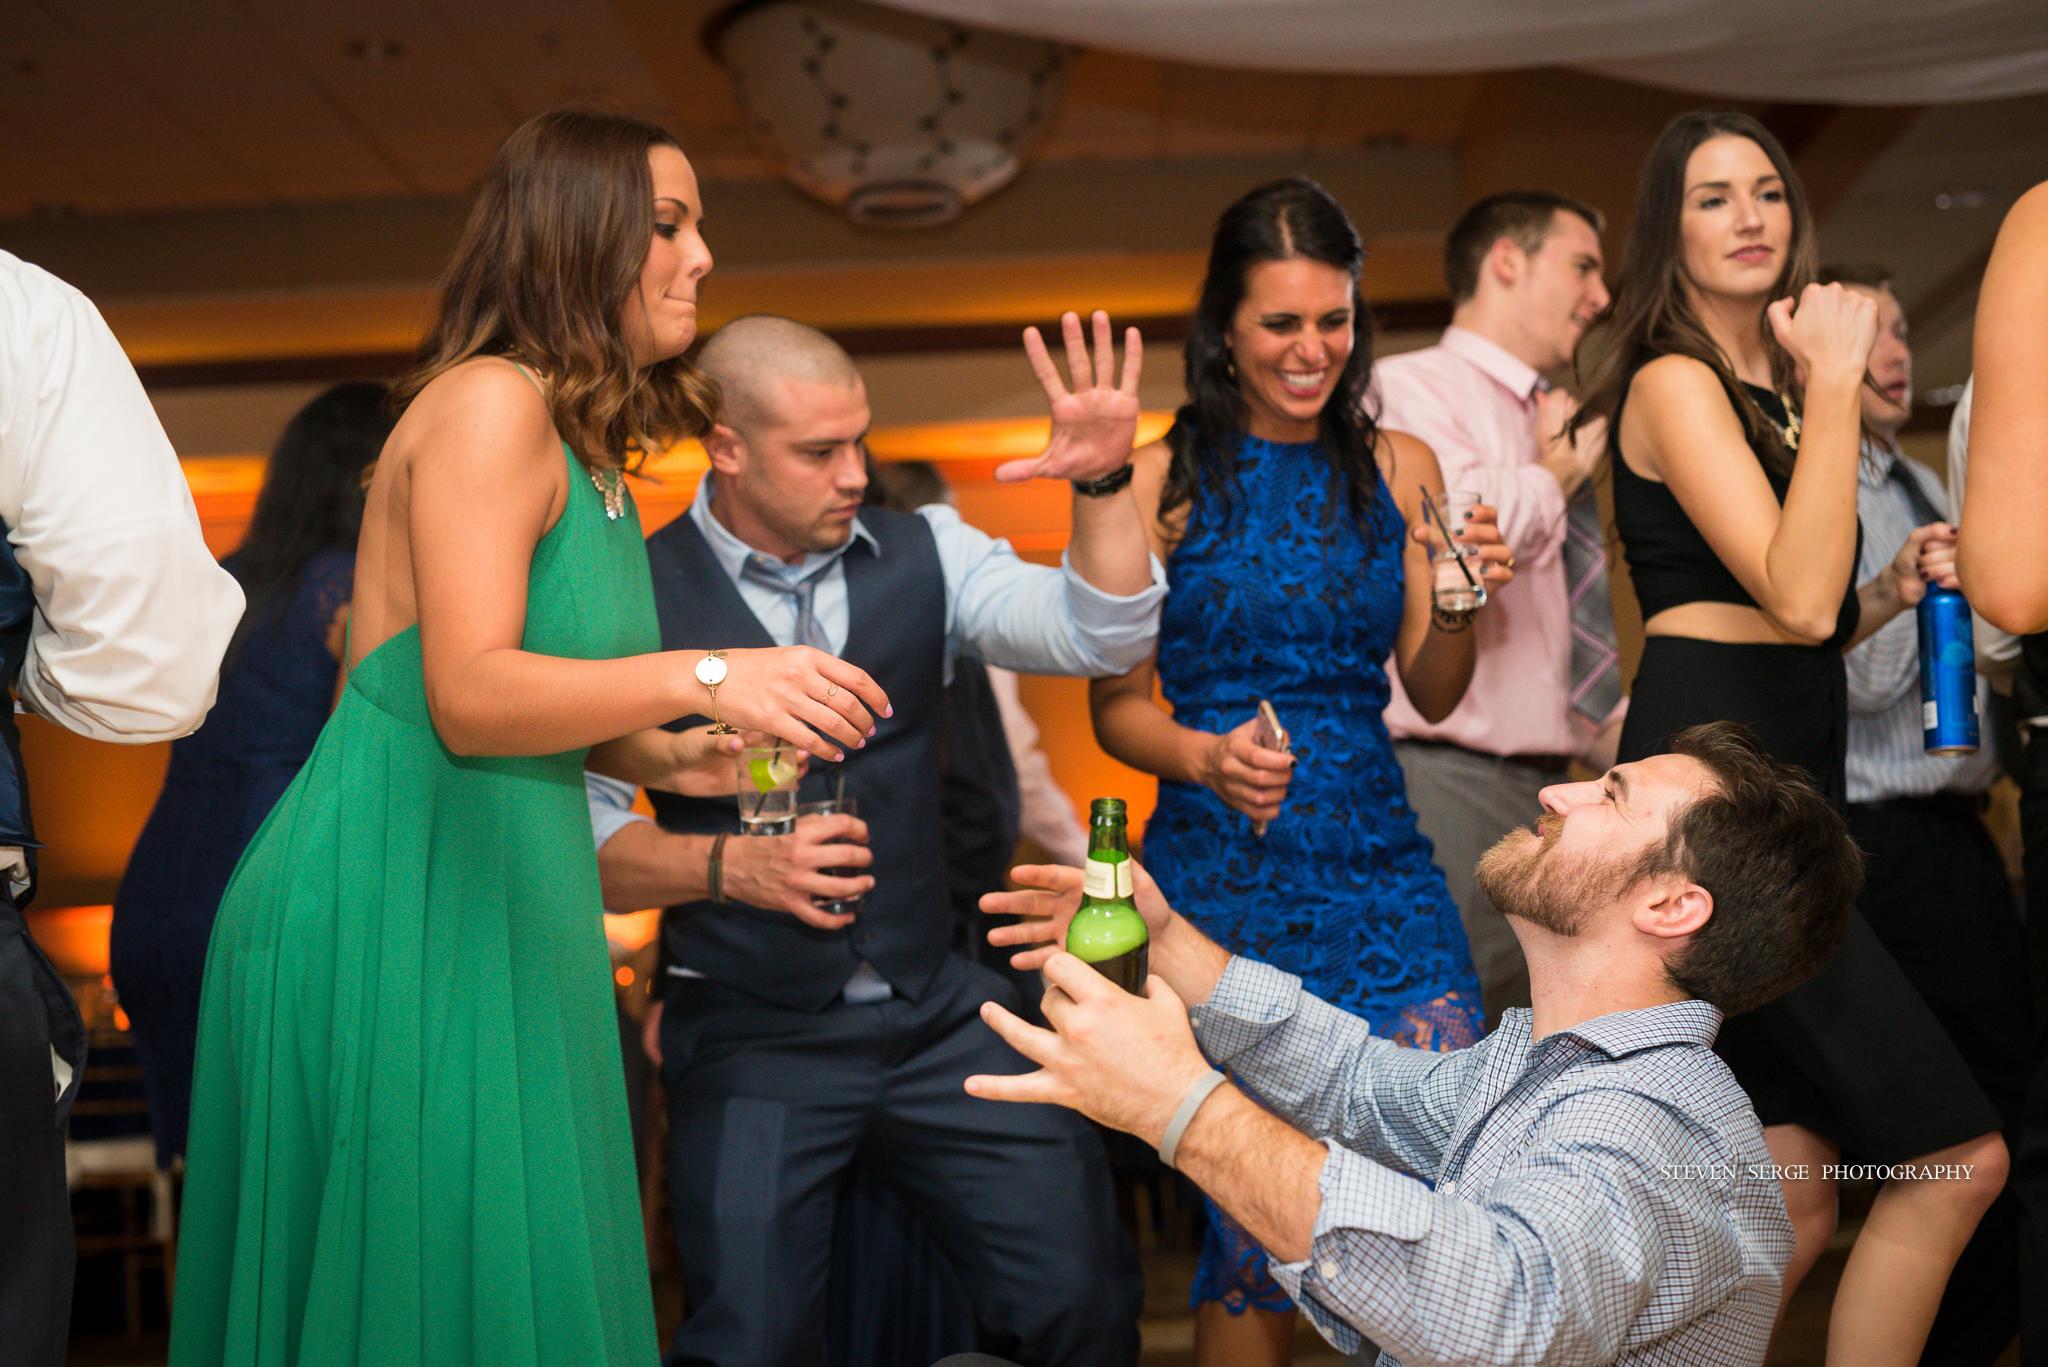 scranton-wedding-photographers-hilton-steven-serge-photography-37.jpg